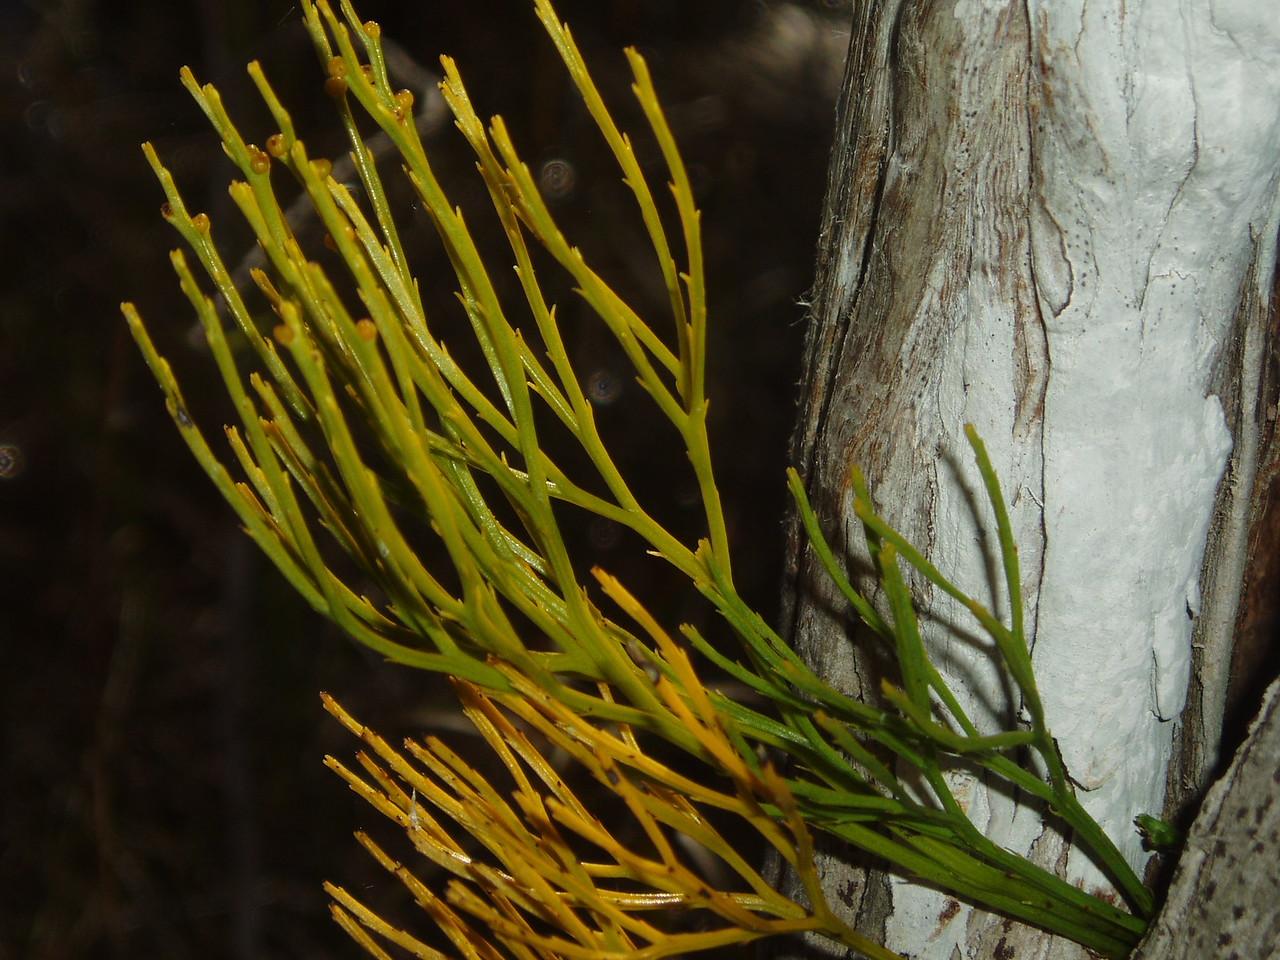 Whisk fern<br /> PHOTO CREDIT: Robert Coveney / Florida Trail Association